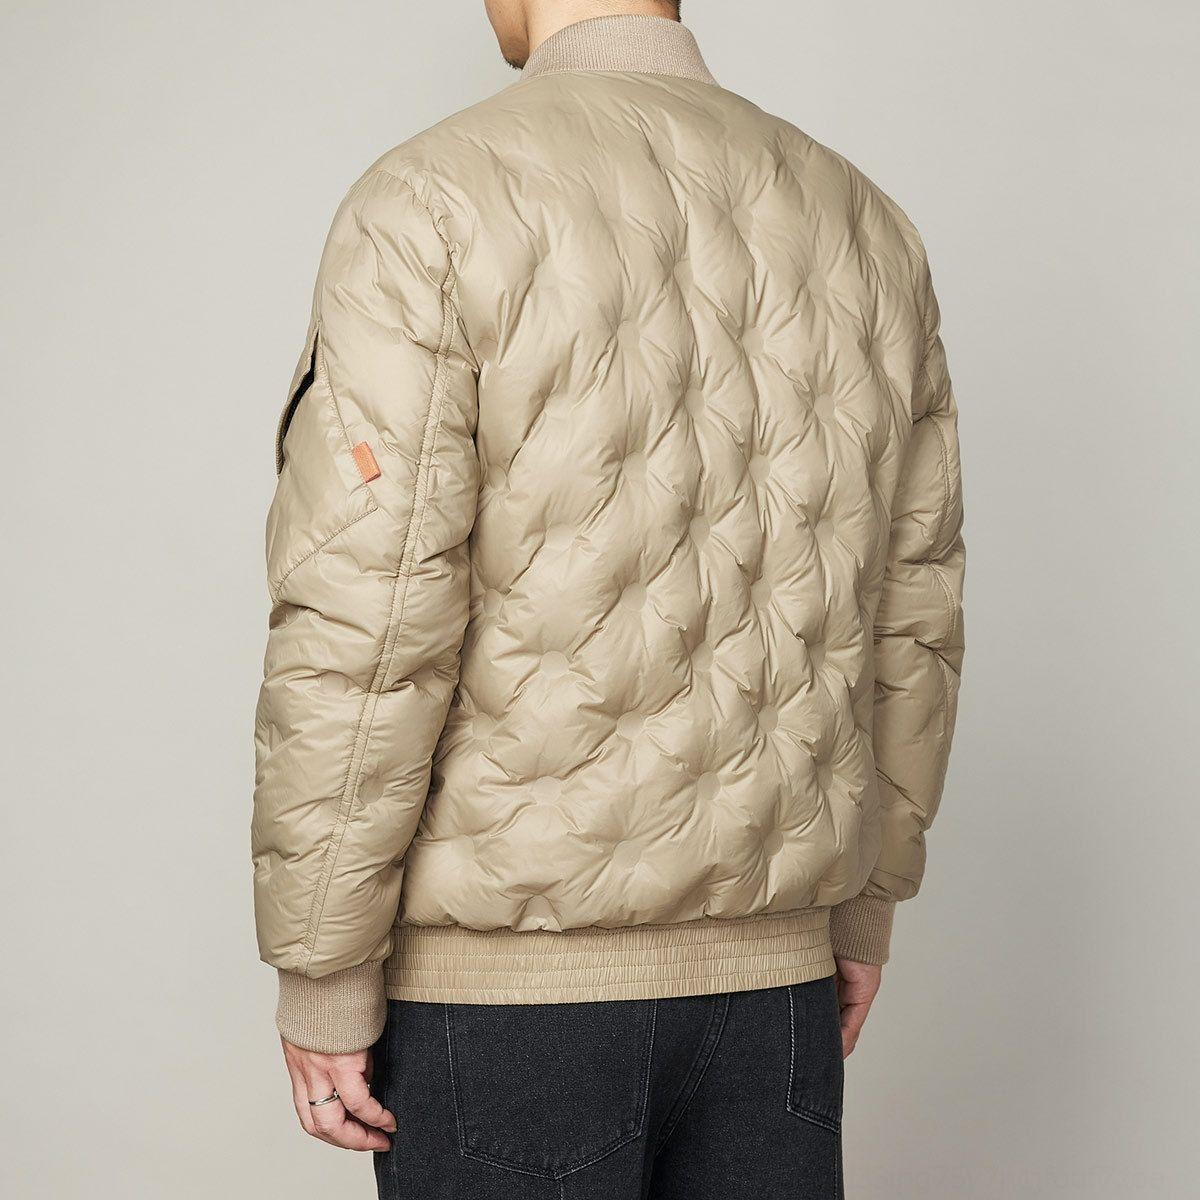 xsay espesando diseñadores abrigos abrigos abrigos chaquetas de abrigo a prueba de viento